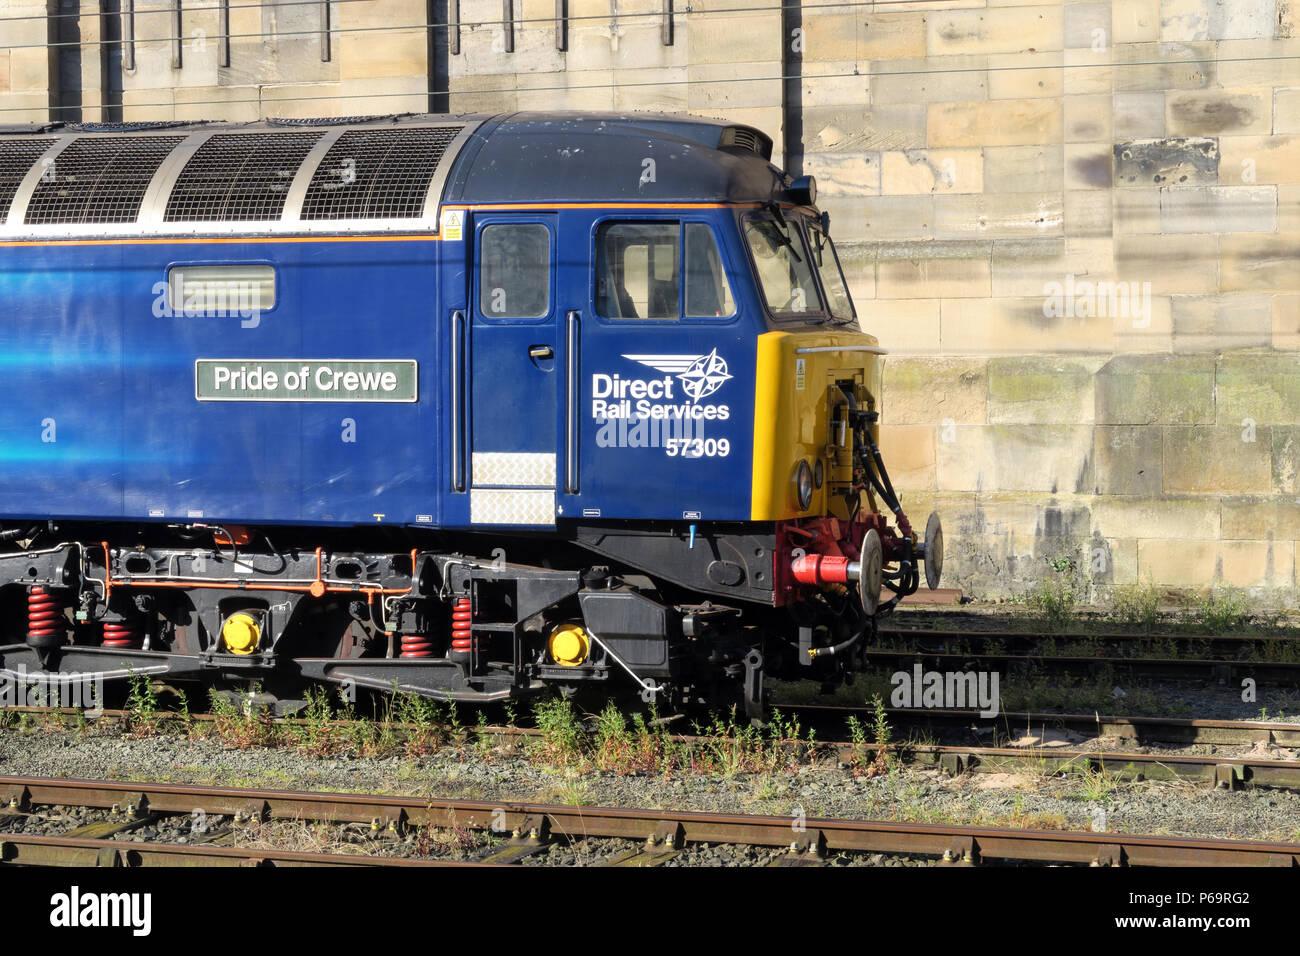 Laden Sie dieses Alamy Stockfoto Direct Rail Services Dieselmotor 57309Stolz von Crewe, in Carlisle Station, Court Square, Cumbria, Carlisle, North West England, UK, CA1 1QZ - P69RG2